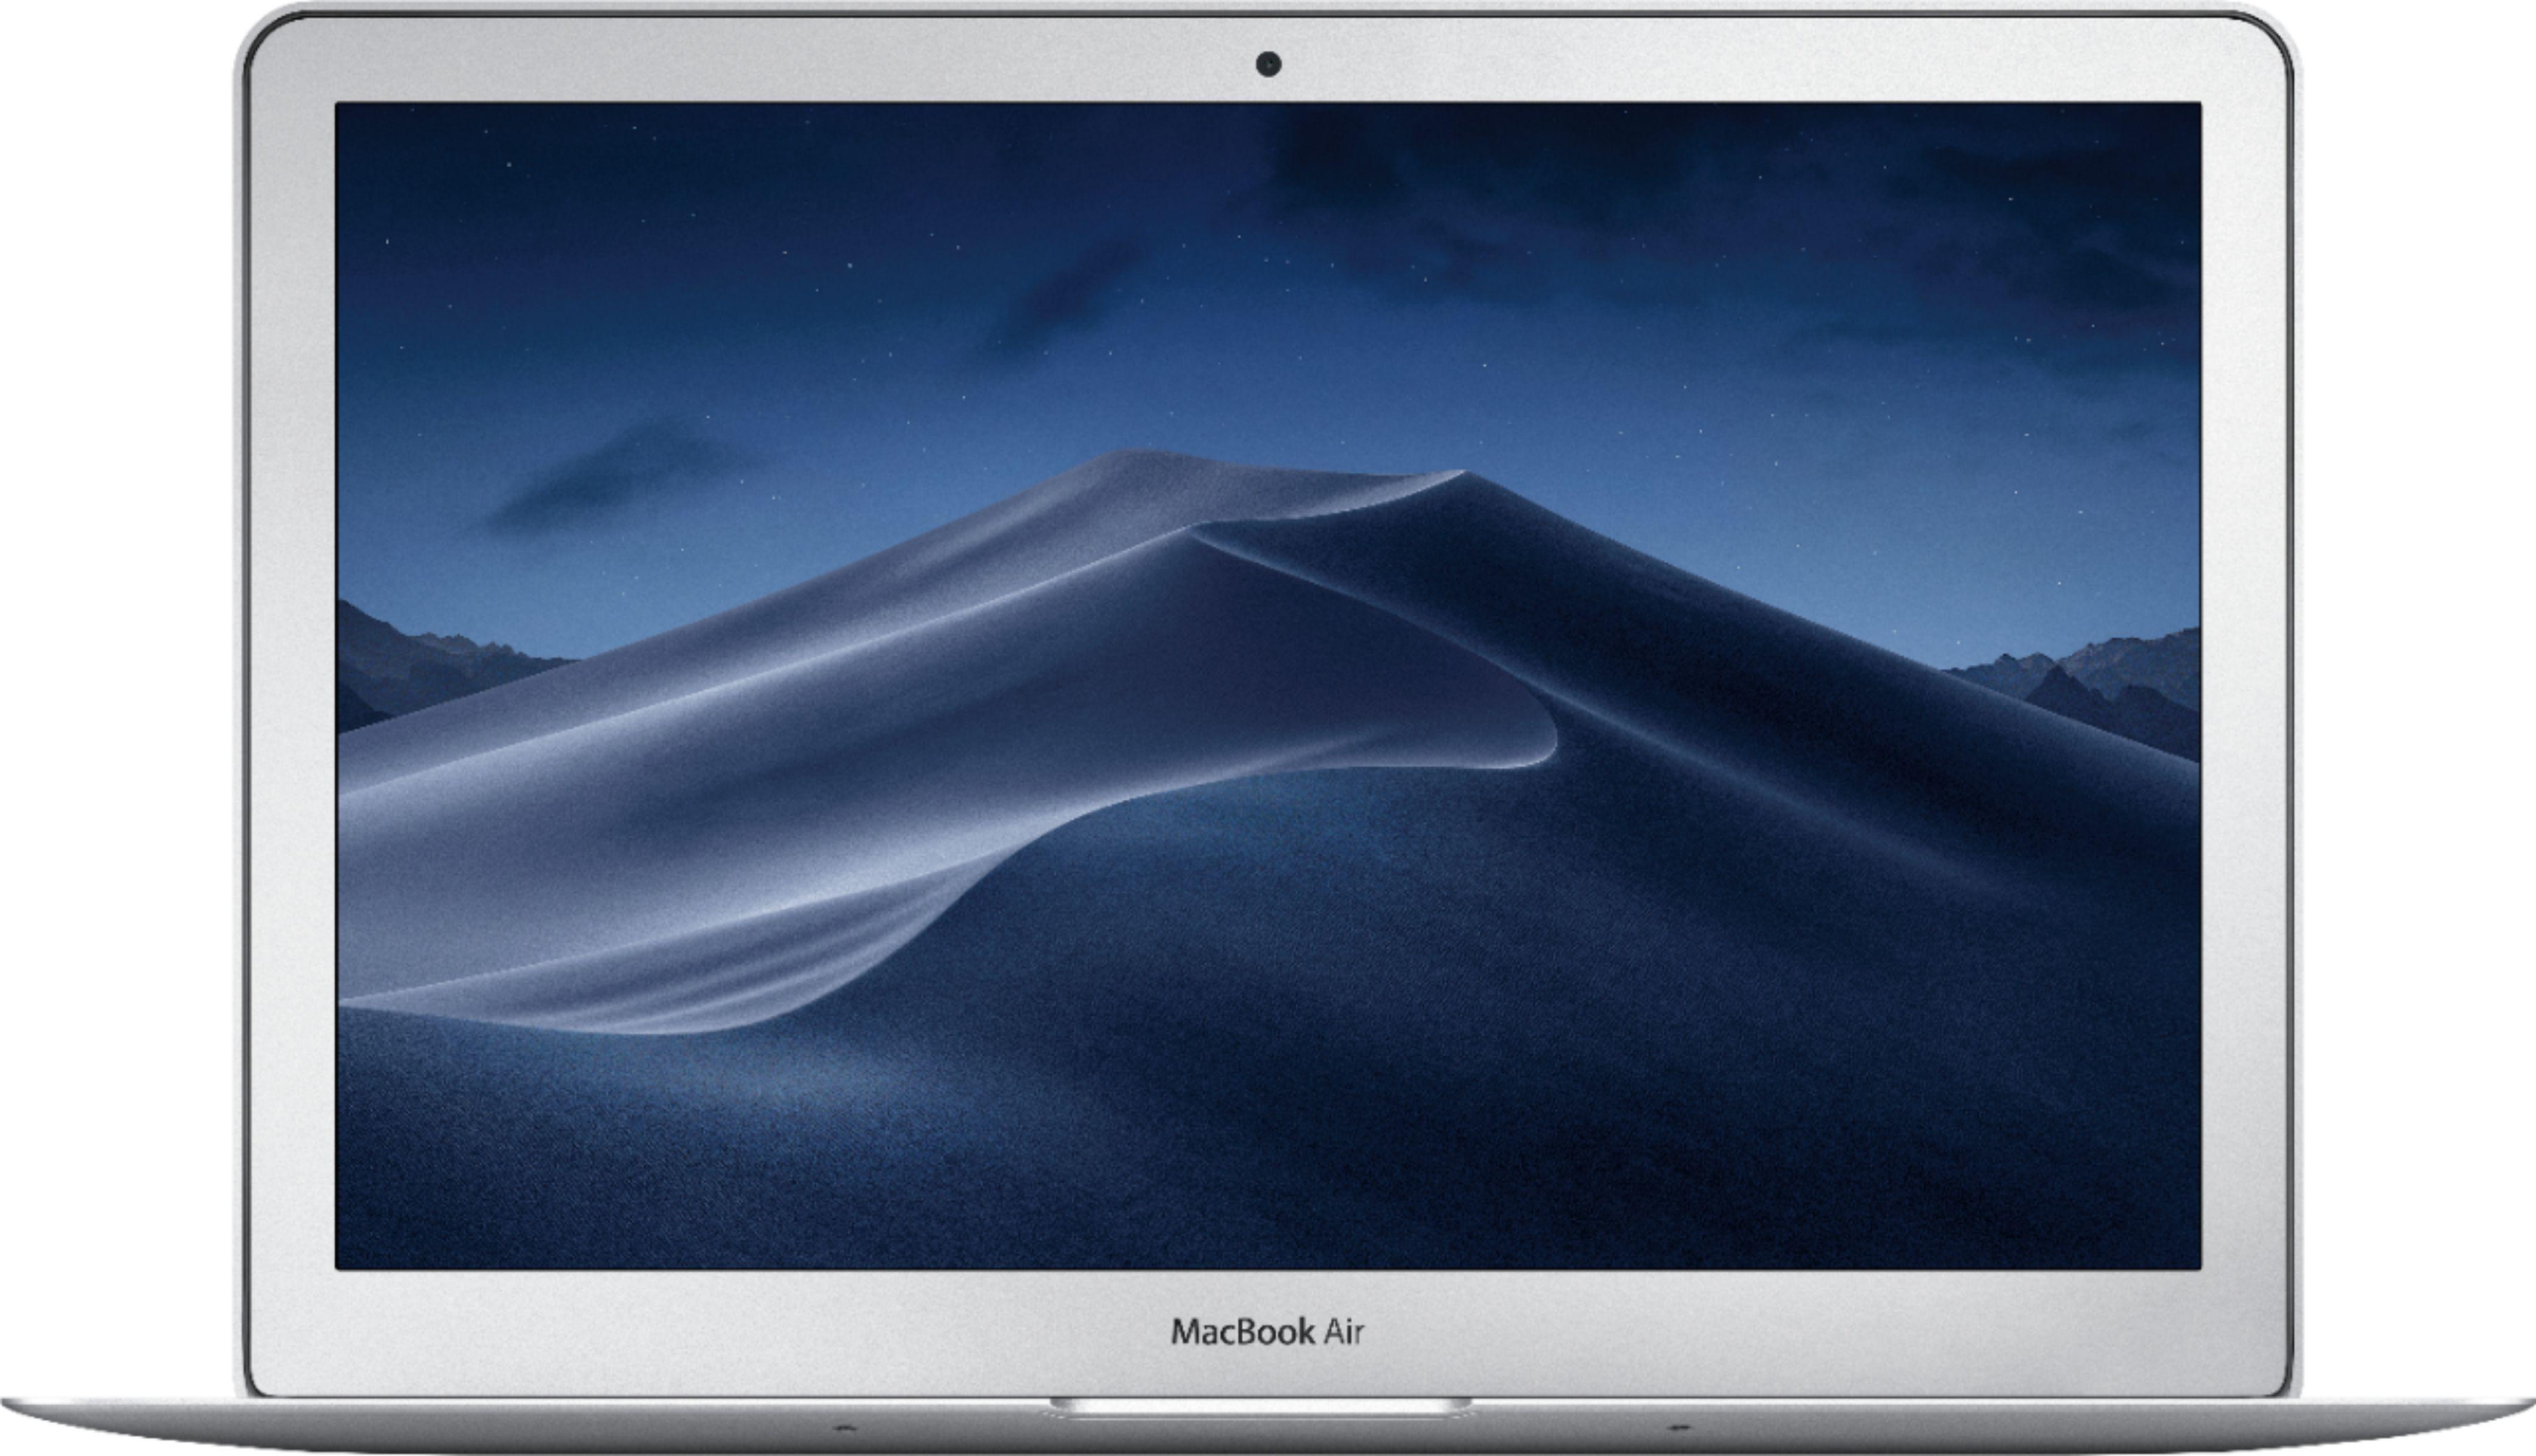 "10 OFF NOW! Apple MacBook Pro RETINA 13"" A1502 Screen"